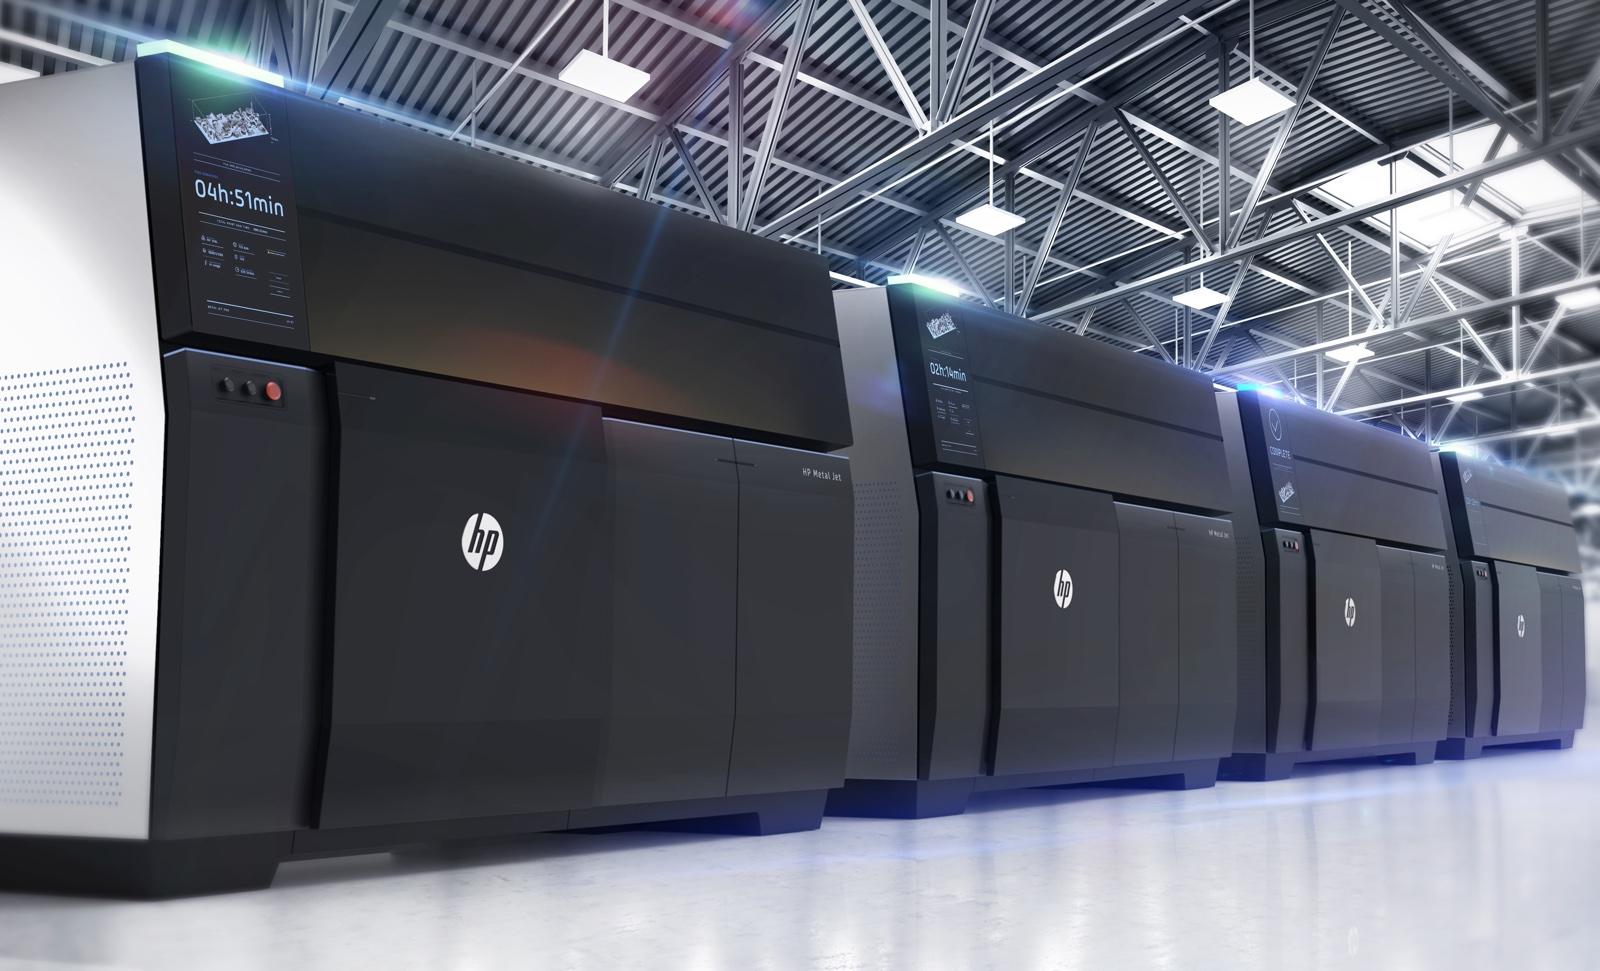 HPがシカゴ国際工作機械見本市でメタルジェット3Dプリンターを展示